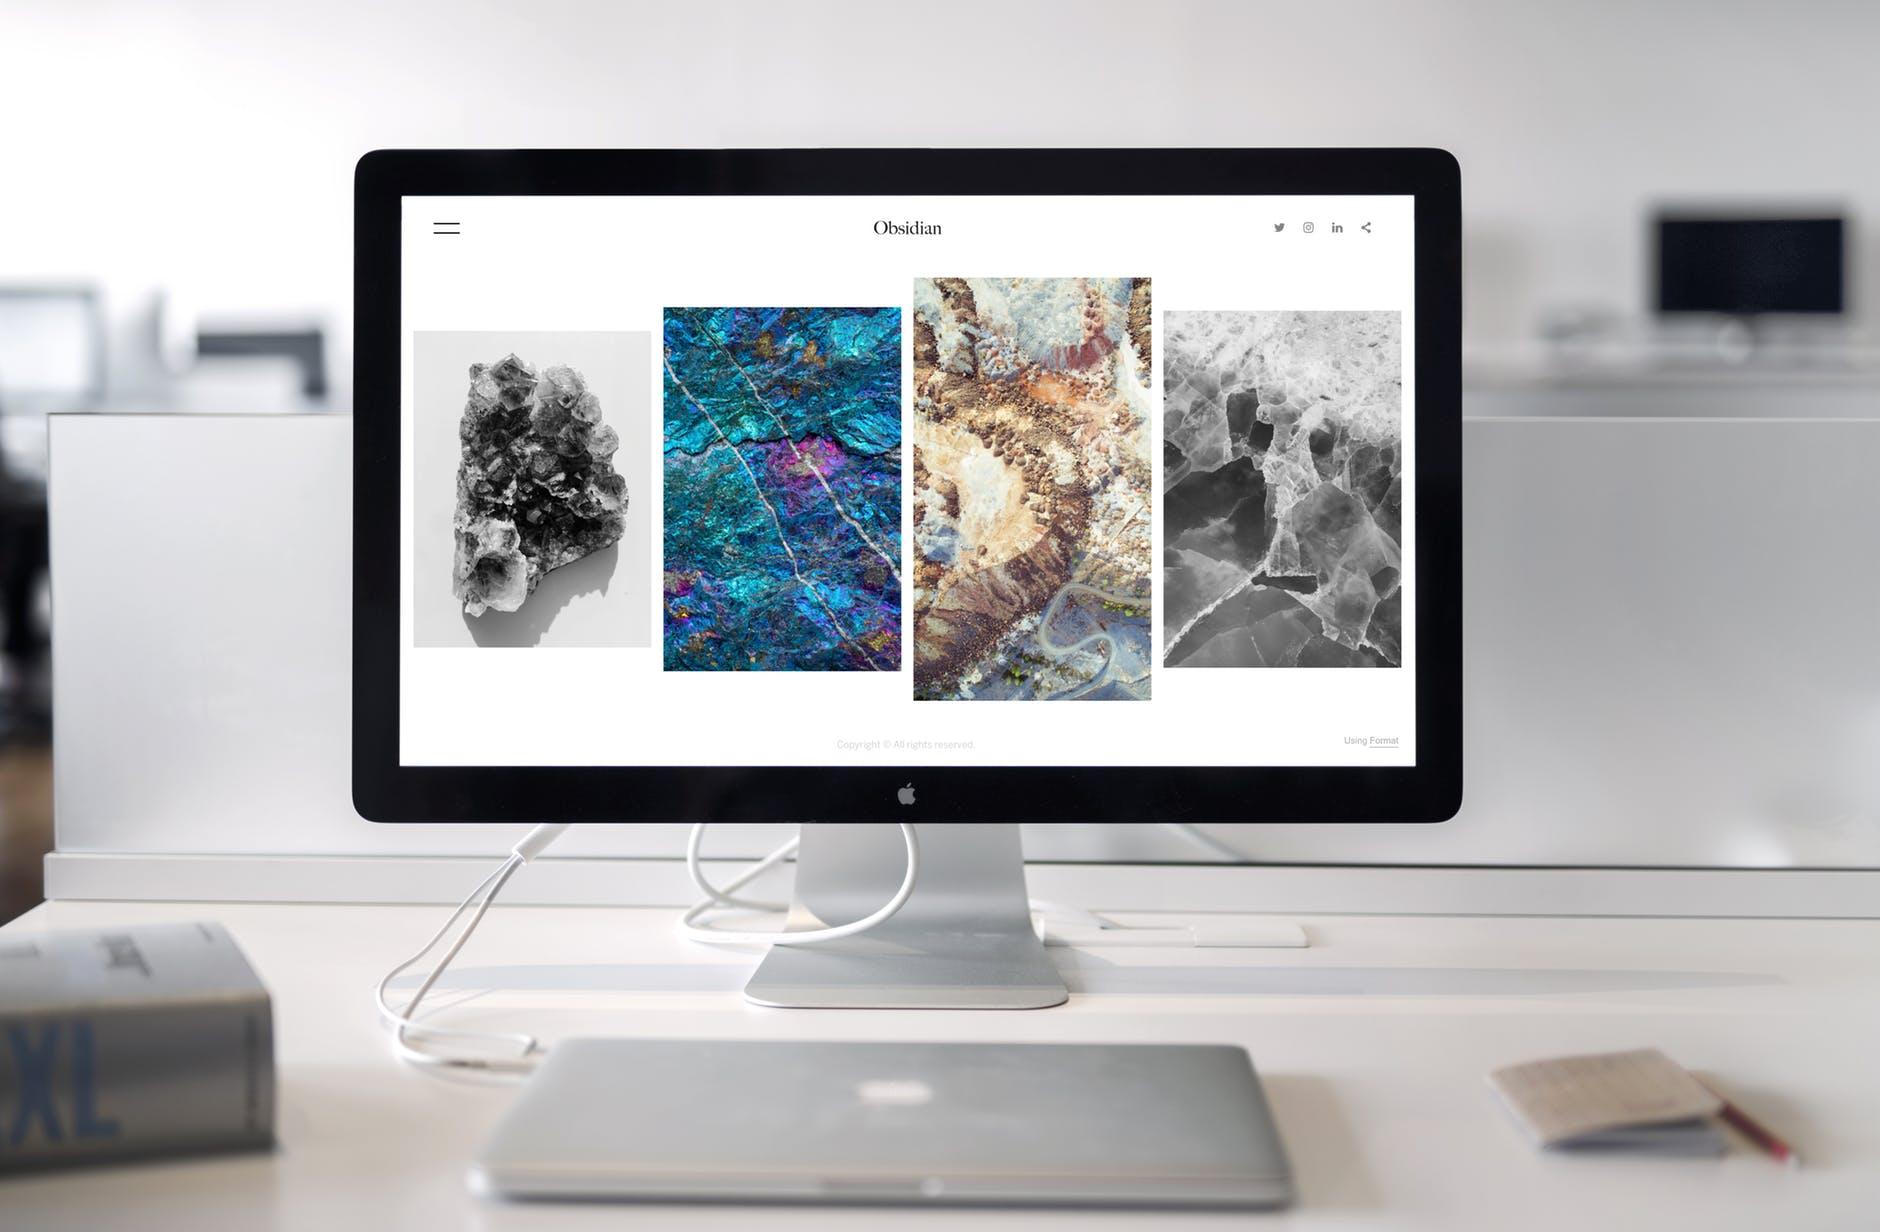 Photo of iMac near Macbook